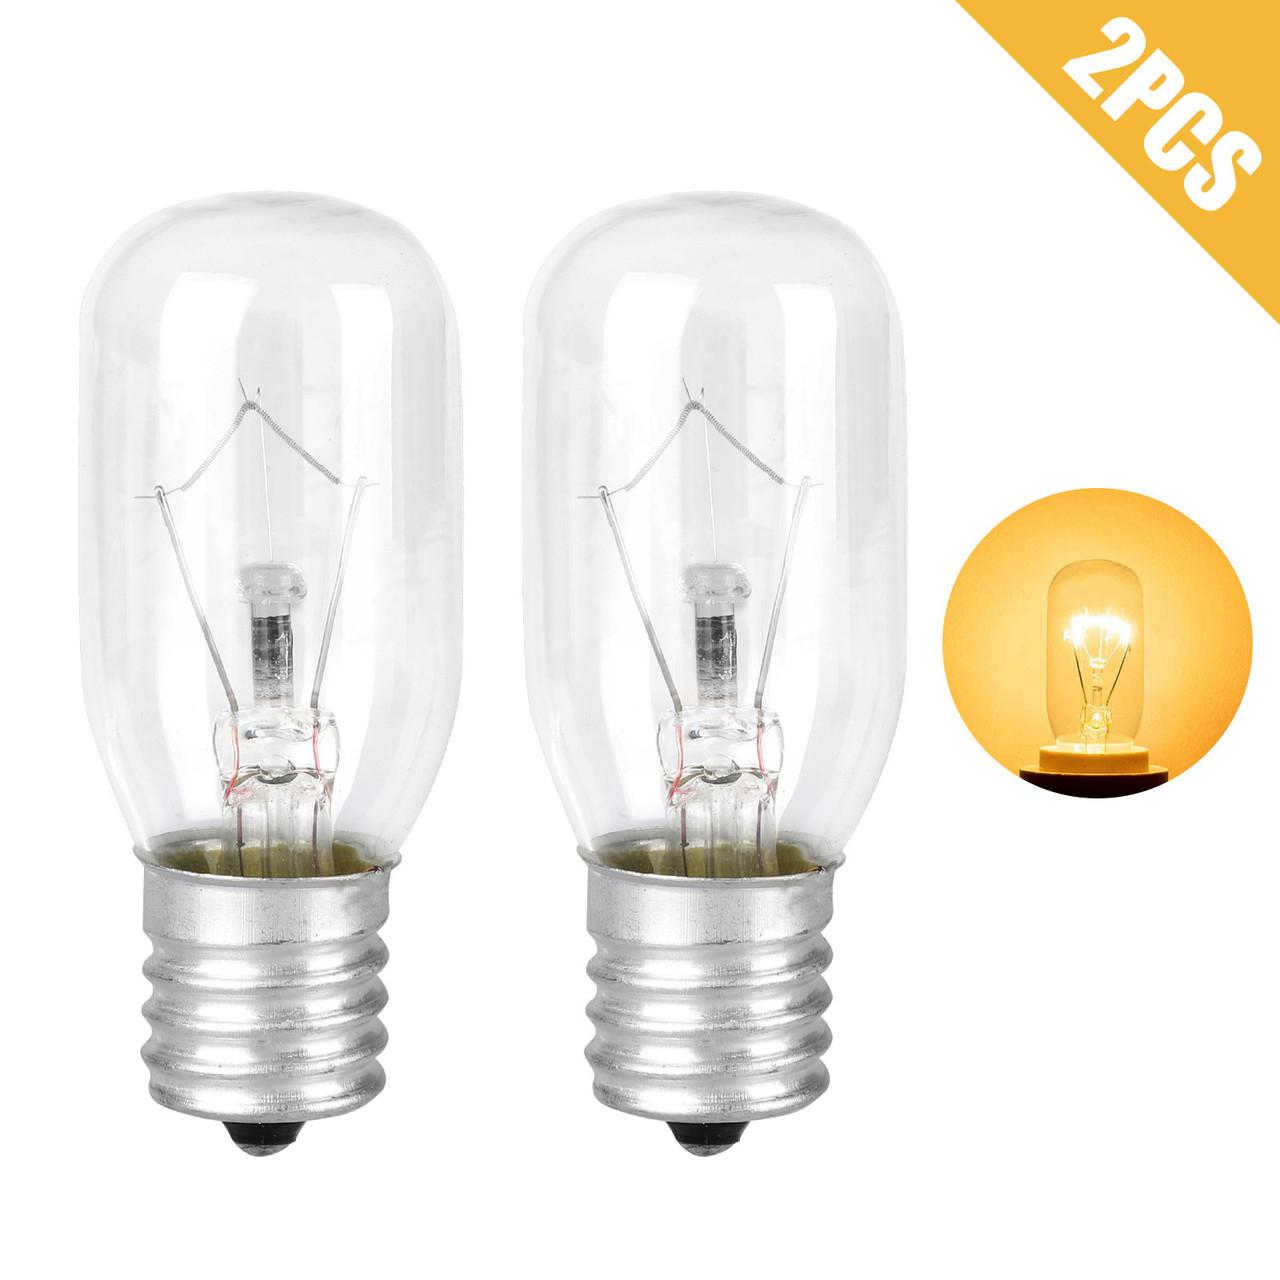 40 watt appliance light bulb light bulb for whirlpool microwave light bulbs e 17 connector type sockets warm yellow 2700k fits for most